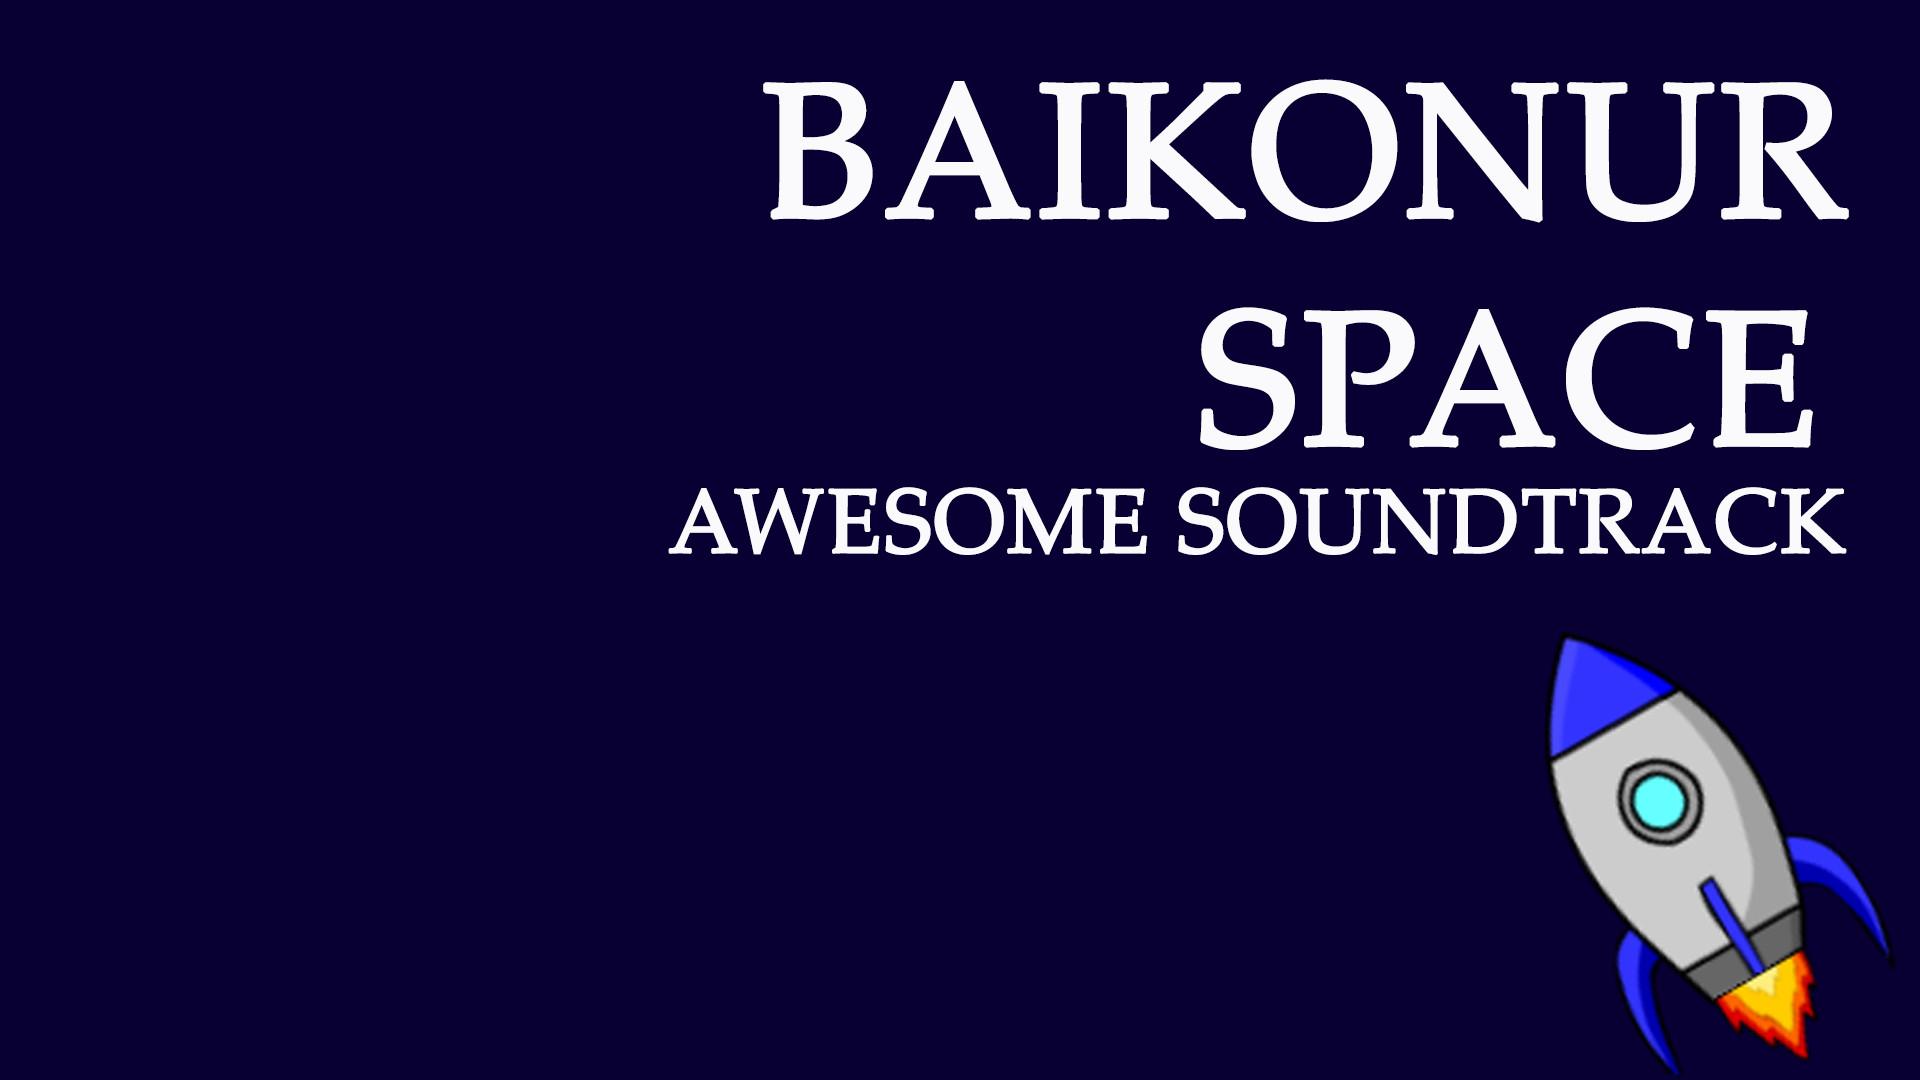 Baikonur Space Awesome Soundtrack screenshot